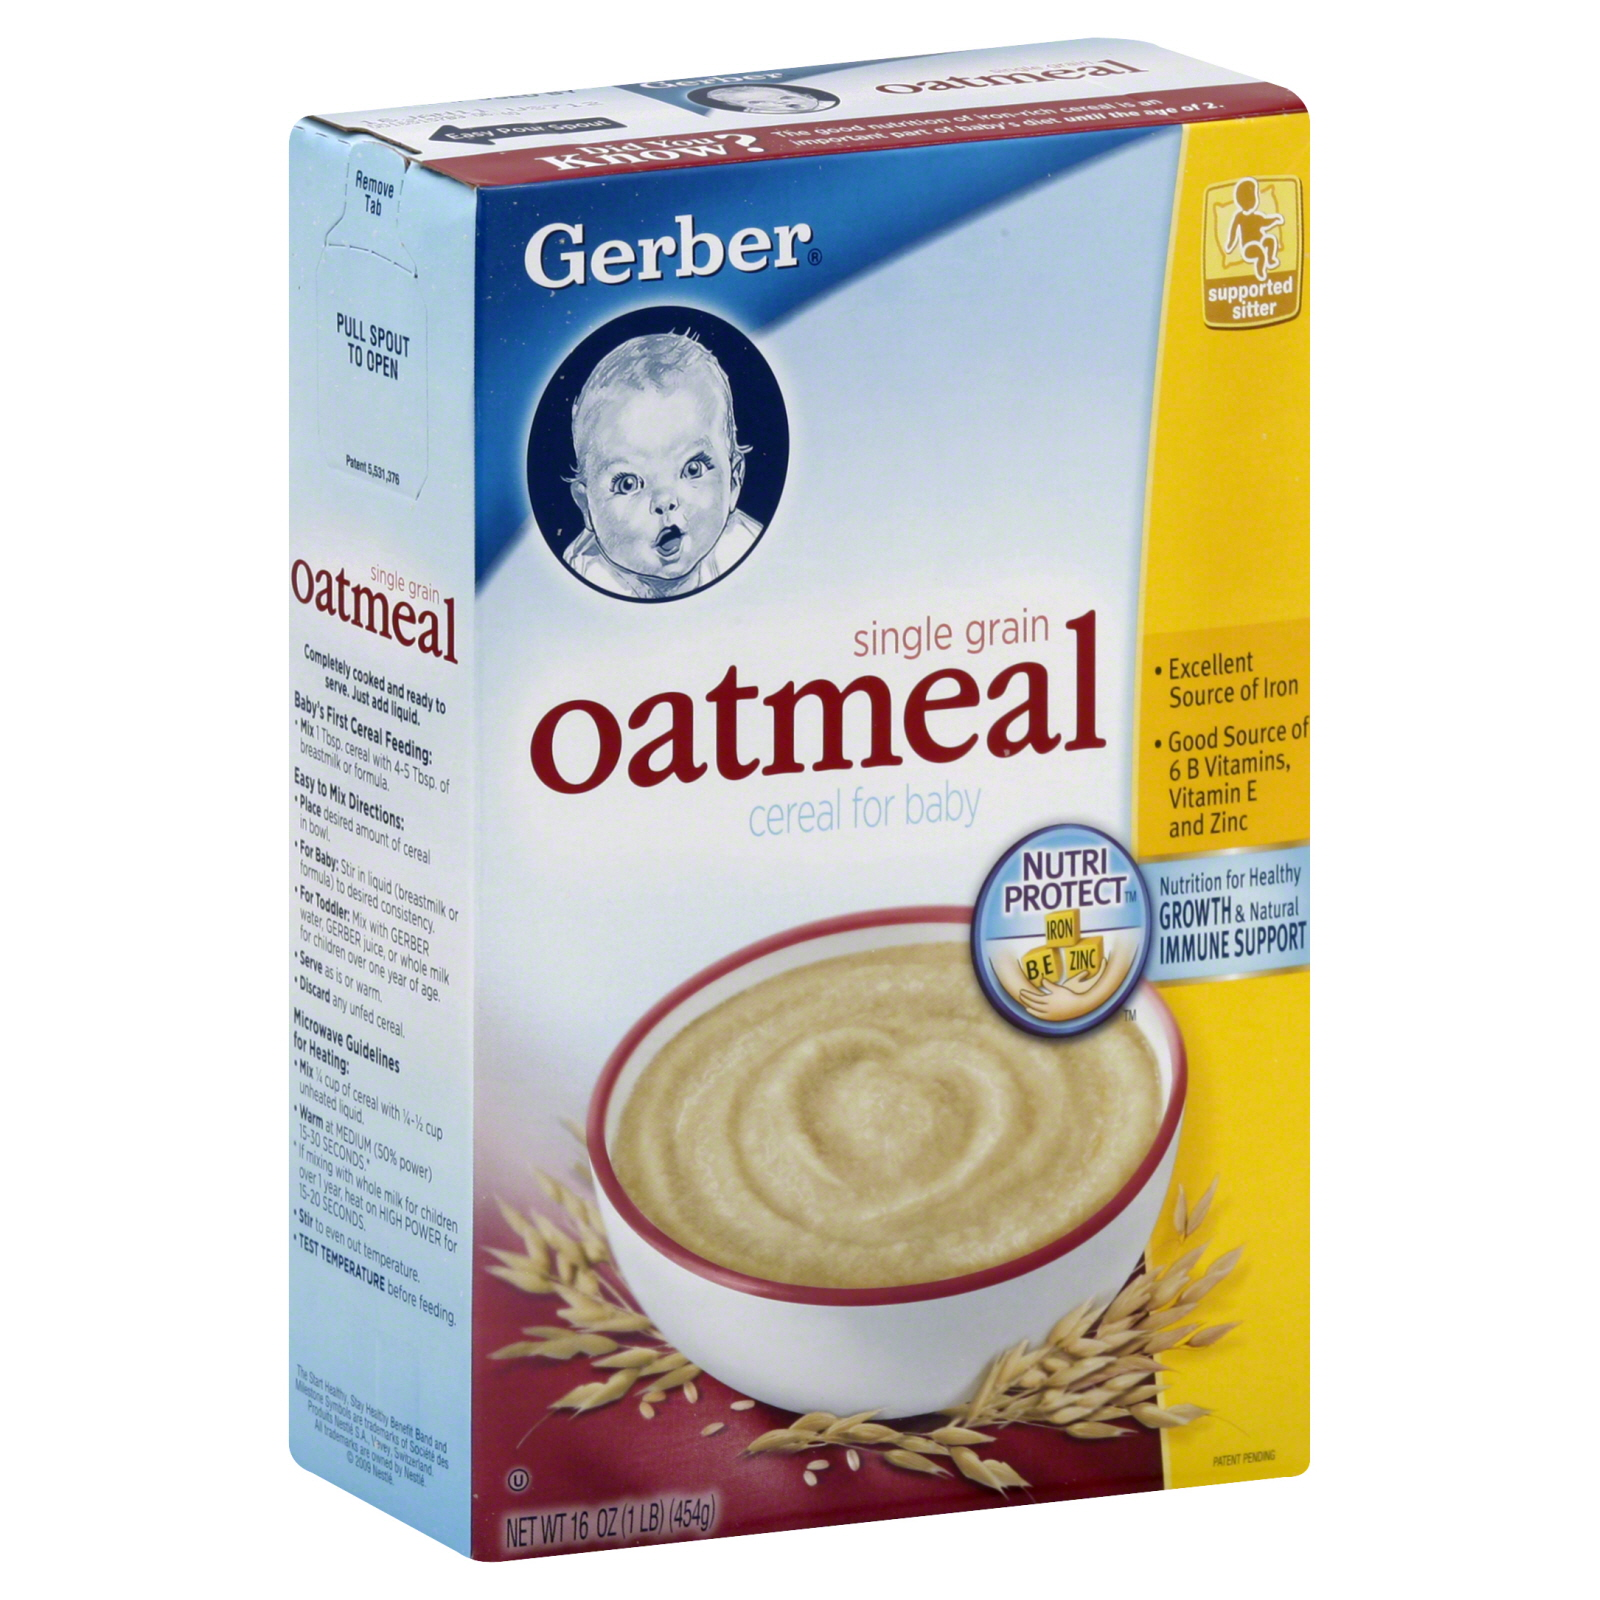 Gerber Baby Cereal Oatmeal Single Grain 16 oz